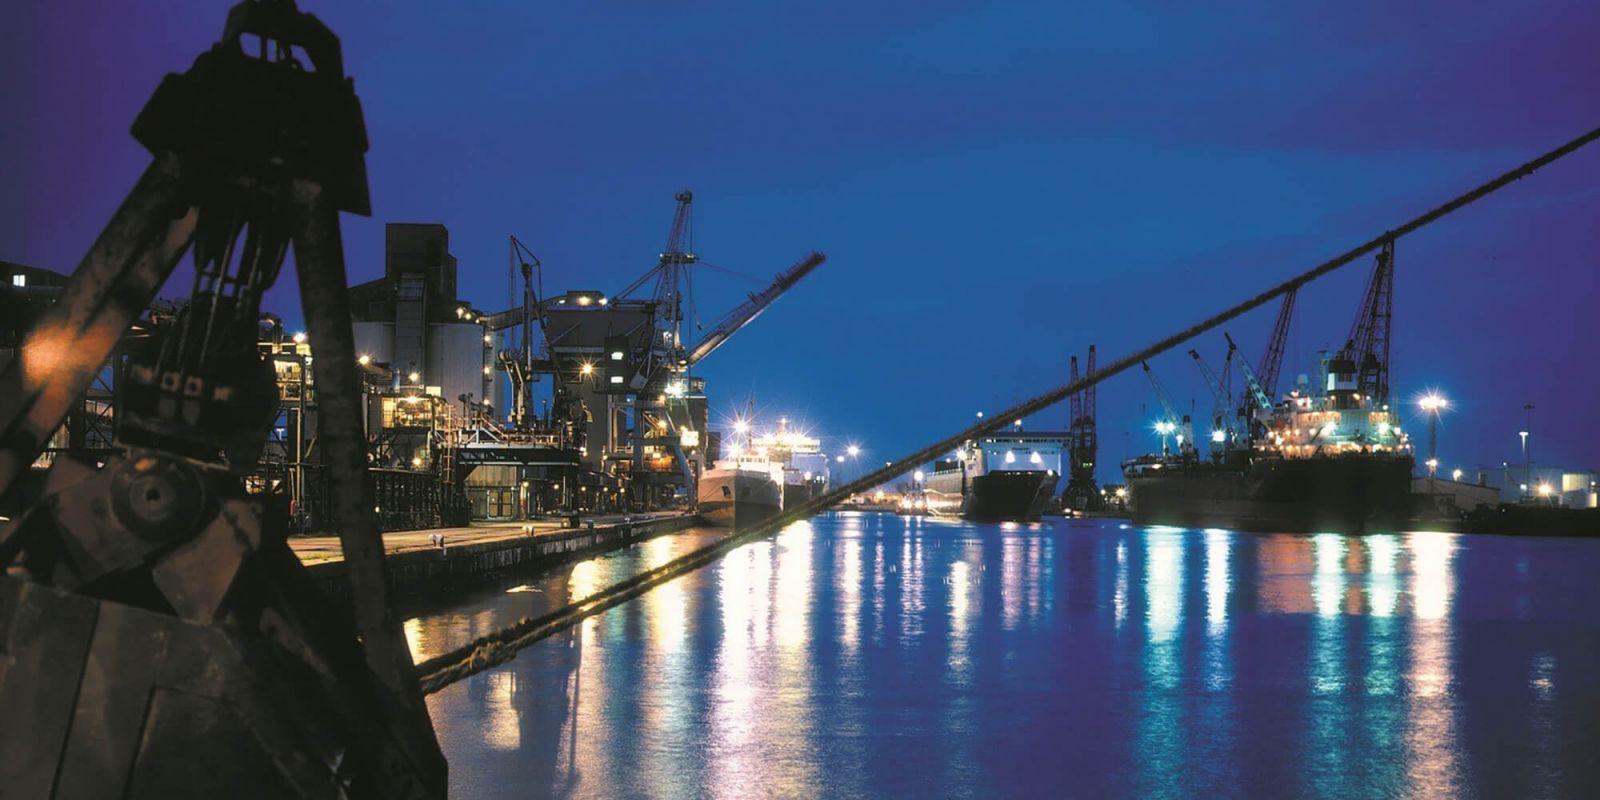 Humber docks